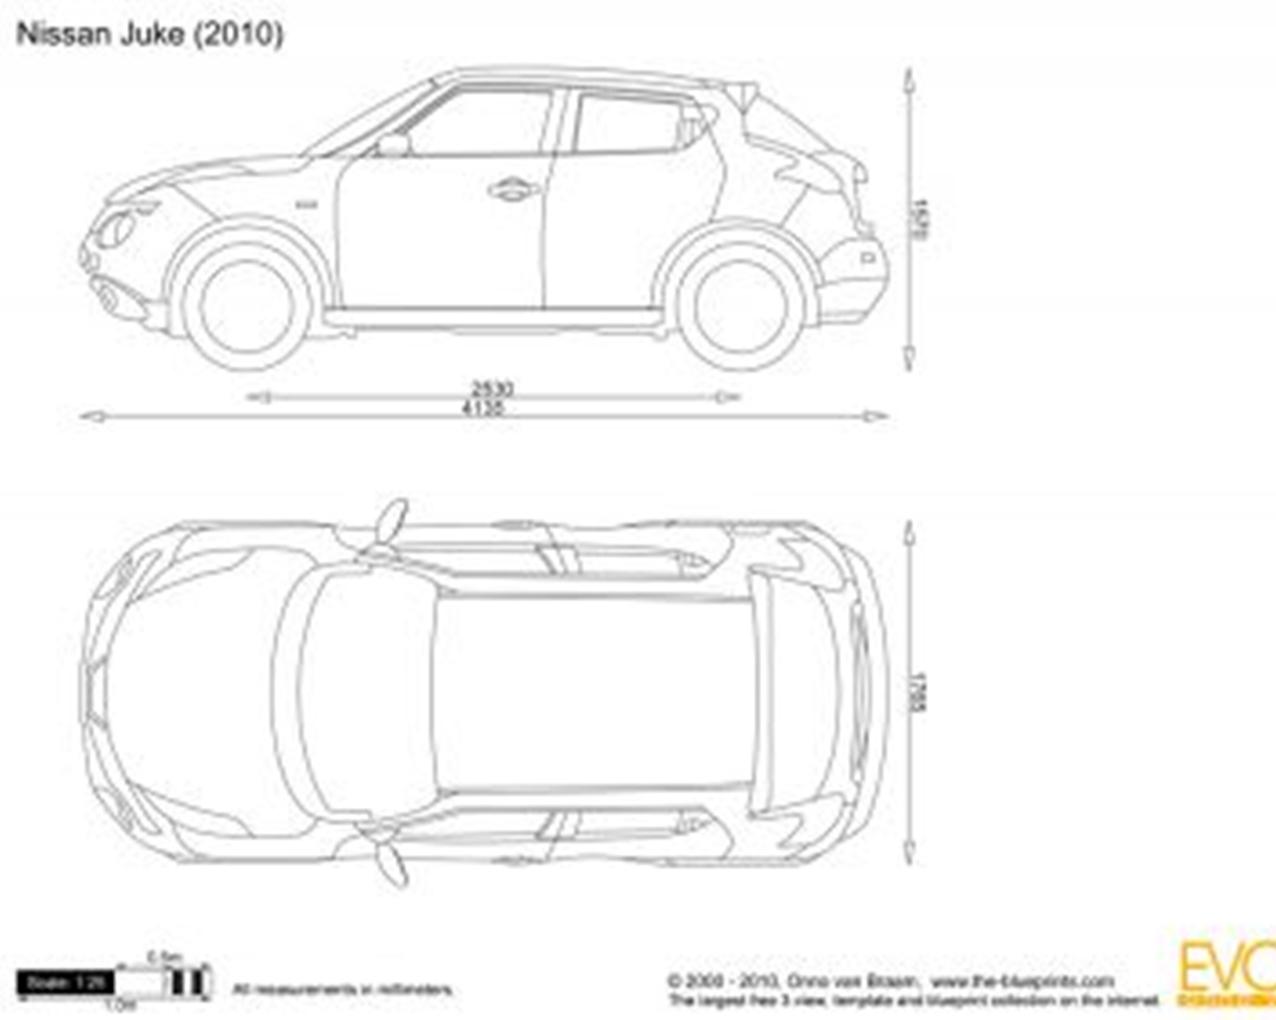 Juke Desain Nyeleneh Dari Nissan Nan Stylish Djohn